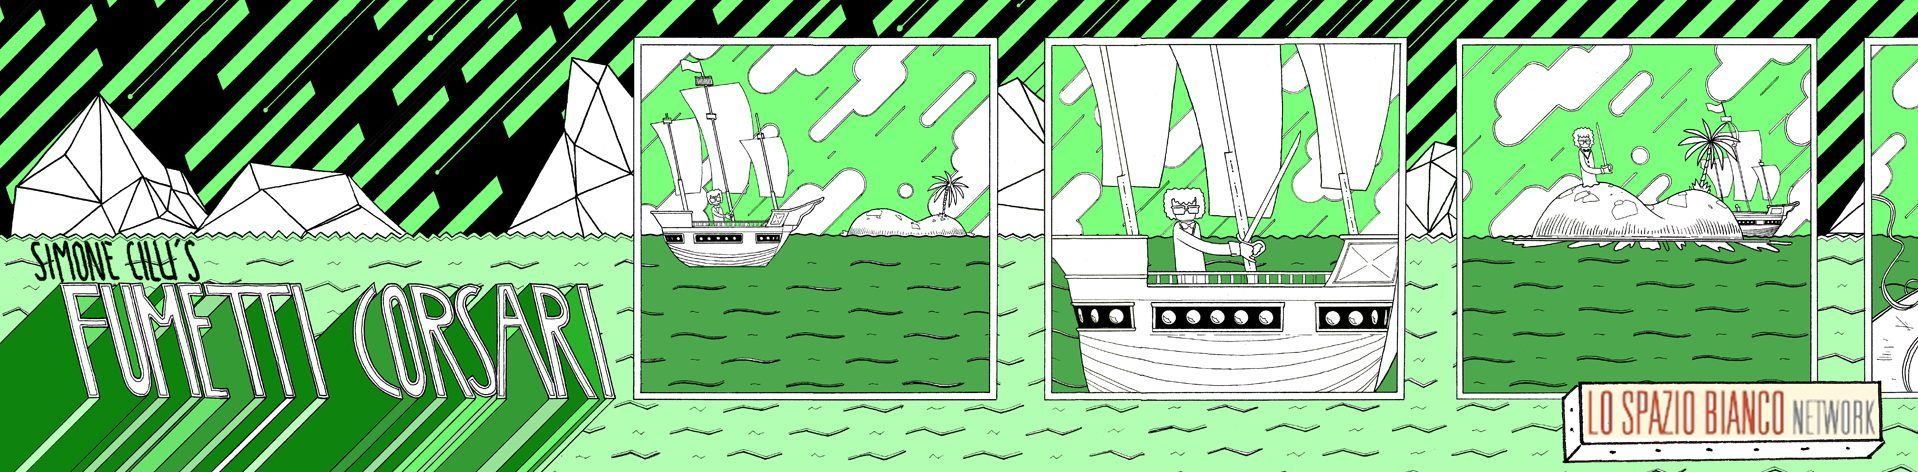 Fumetti Corsari